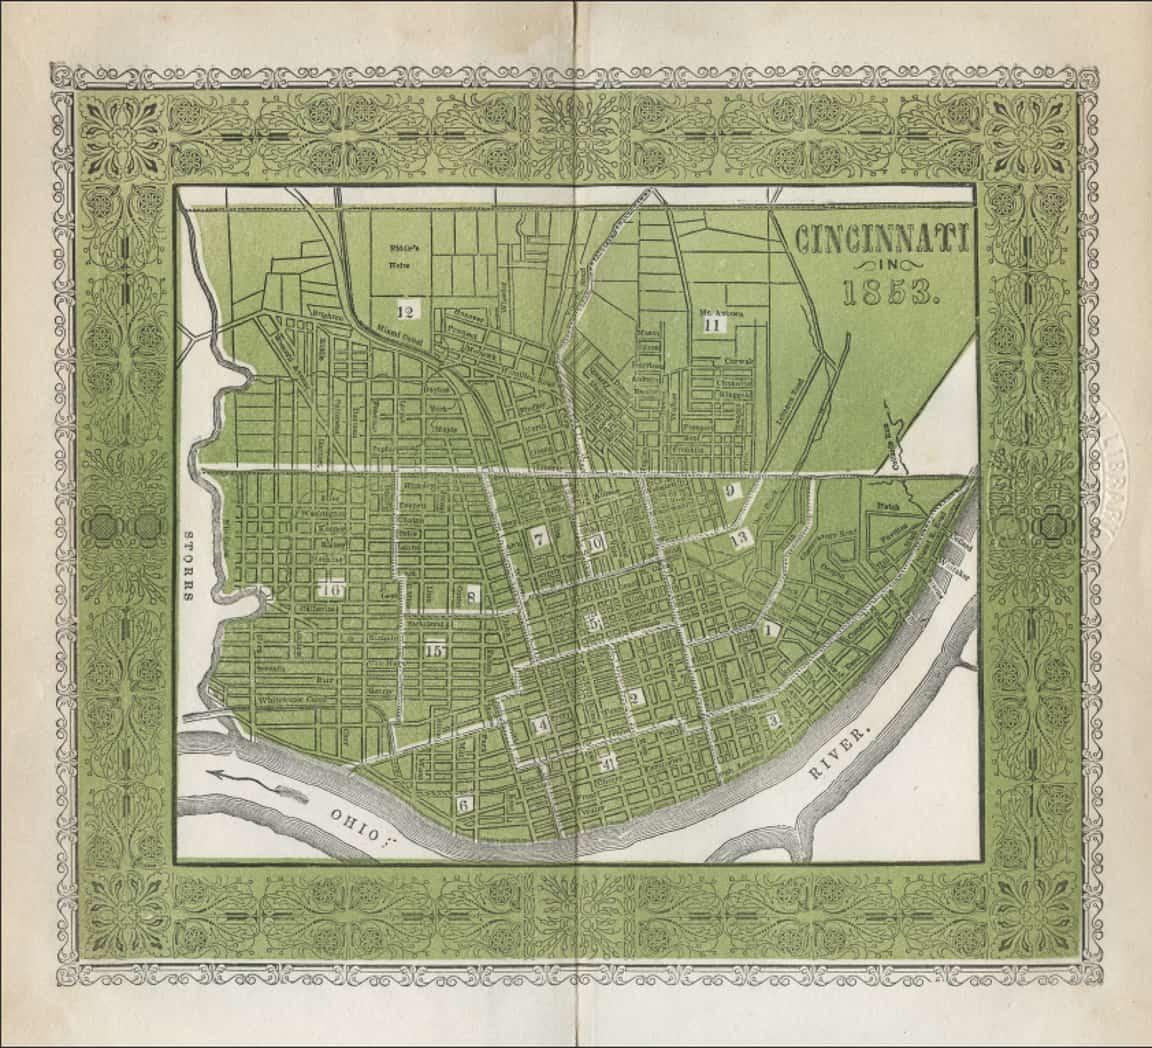 CincinnatiMap1853